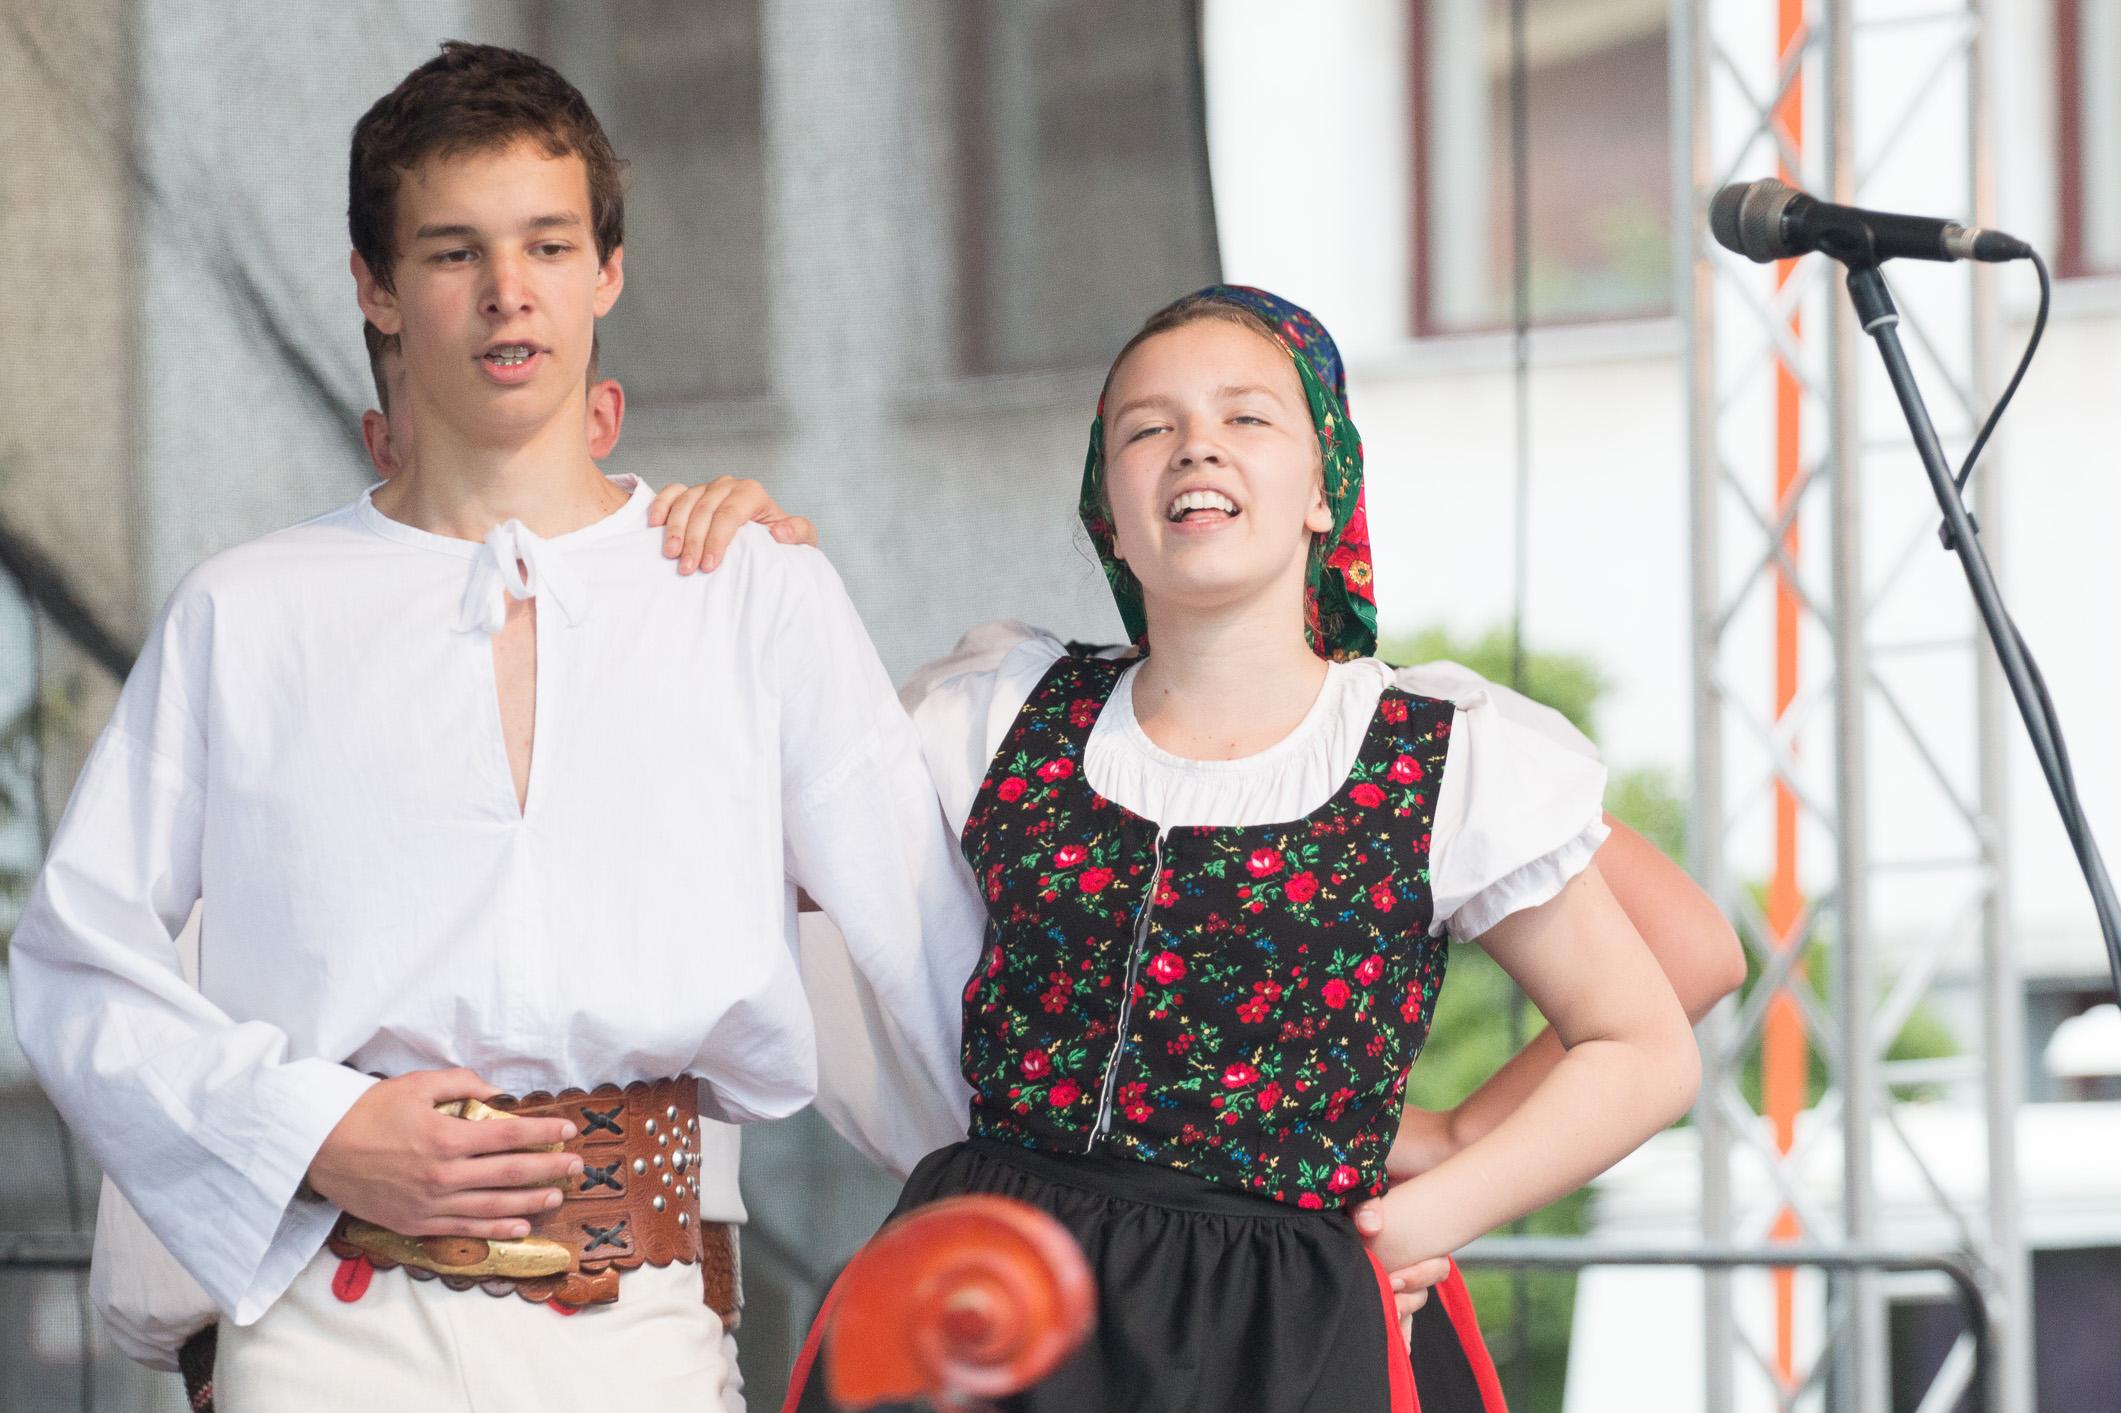 folklor-korzo-2016-zvolen-11